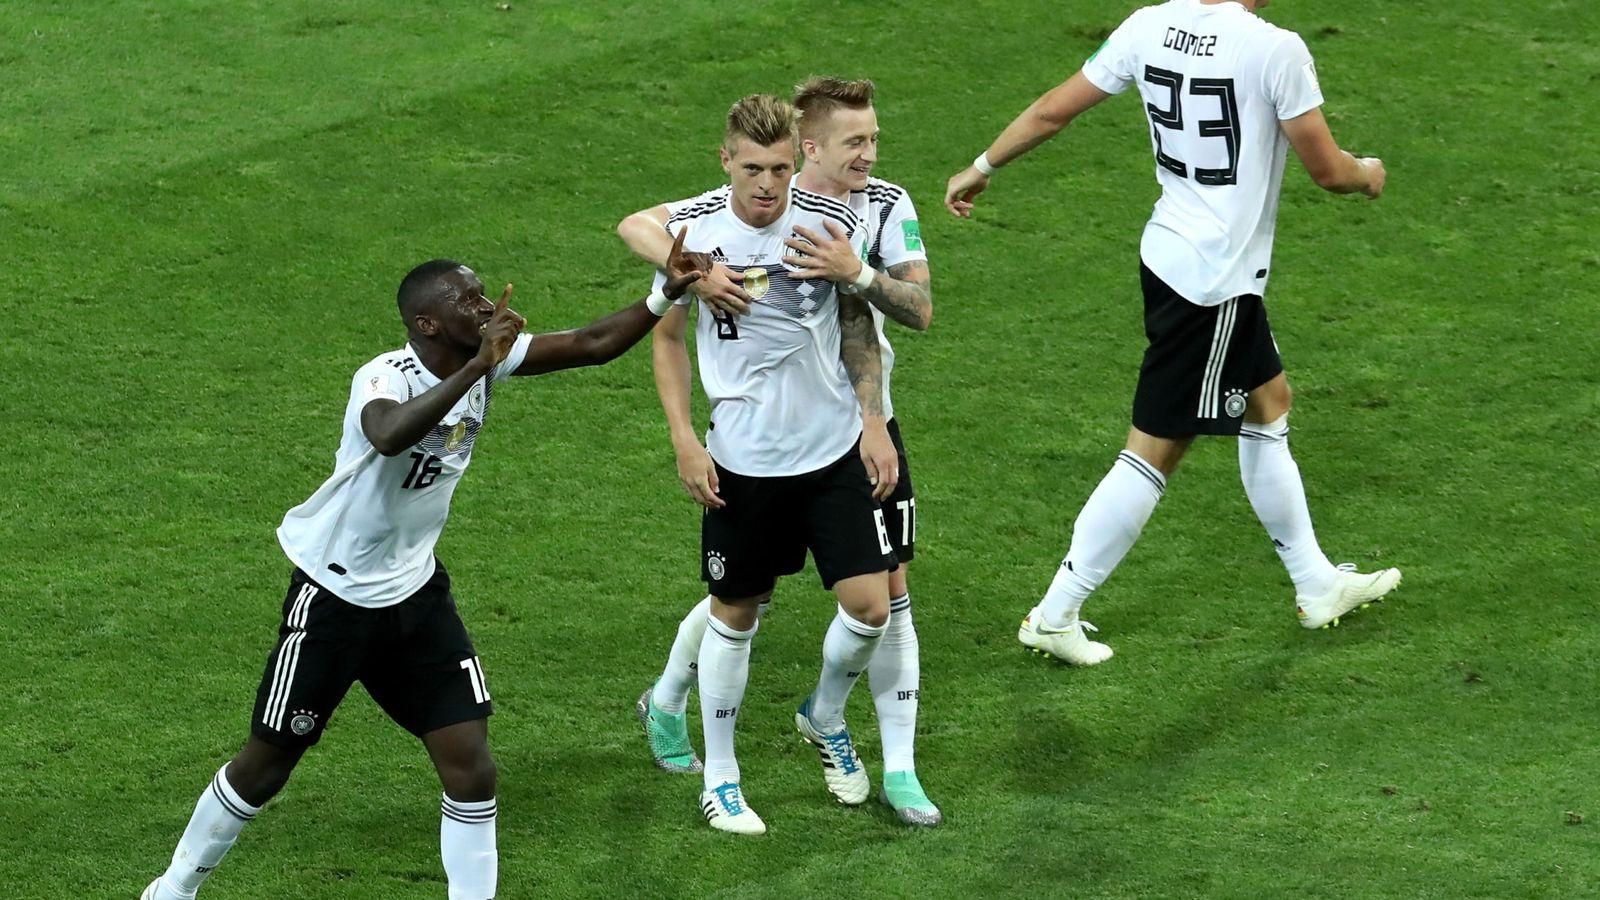 Foto: Group f germany vs sweden